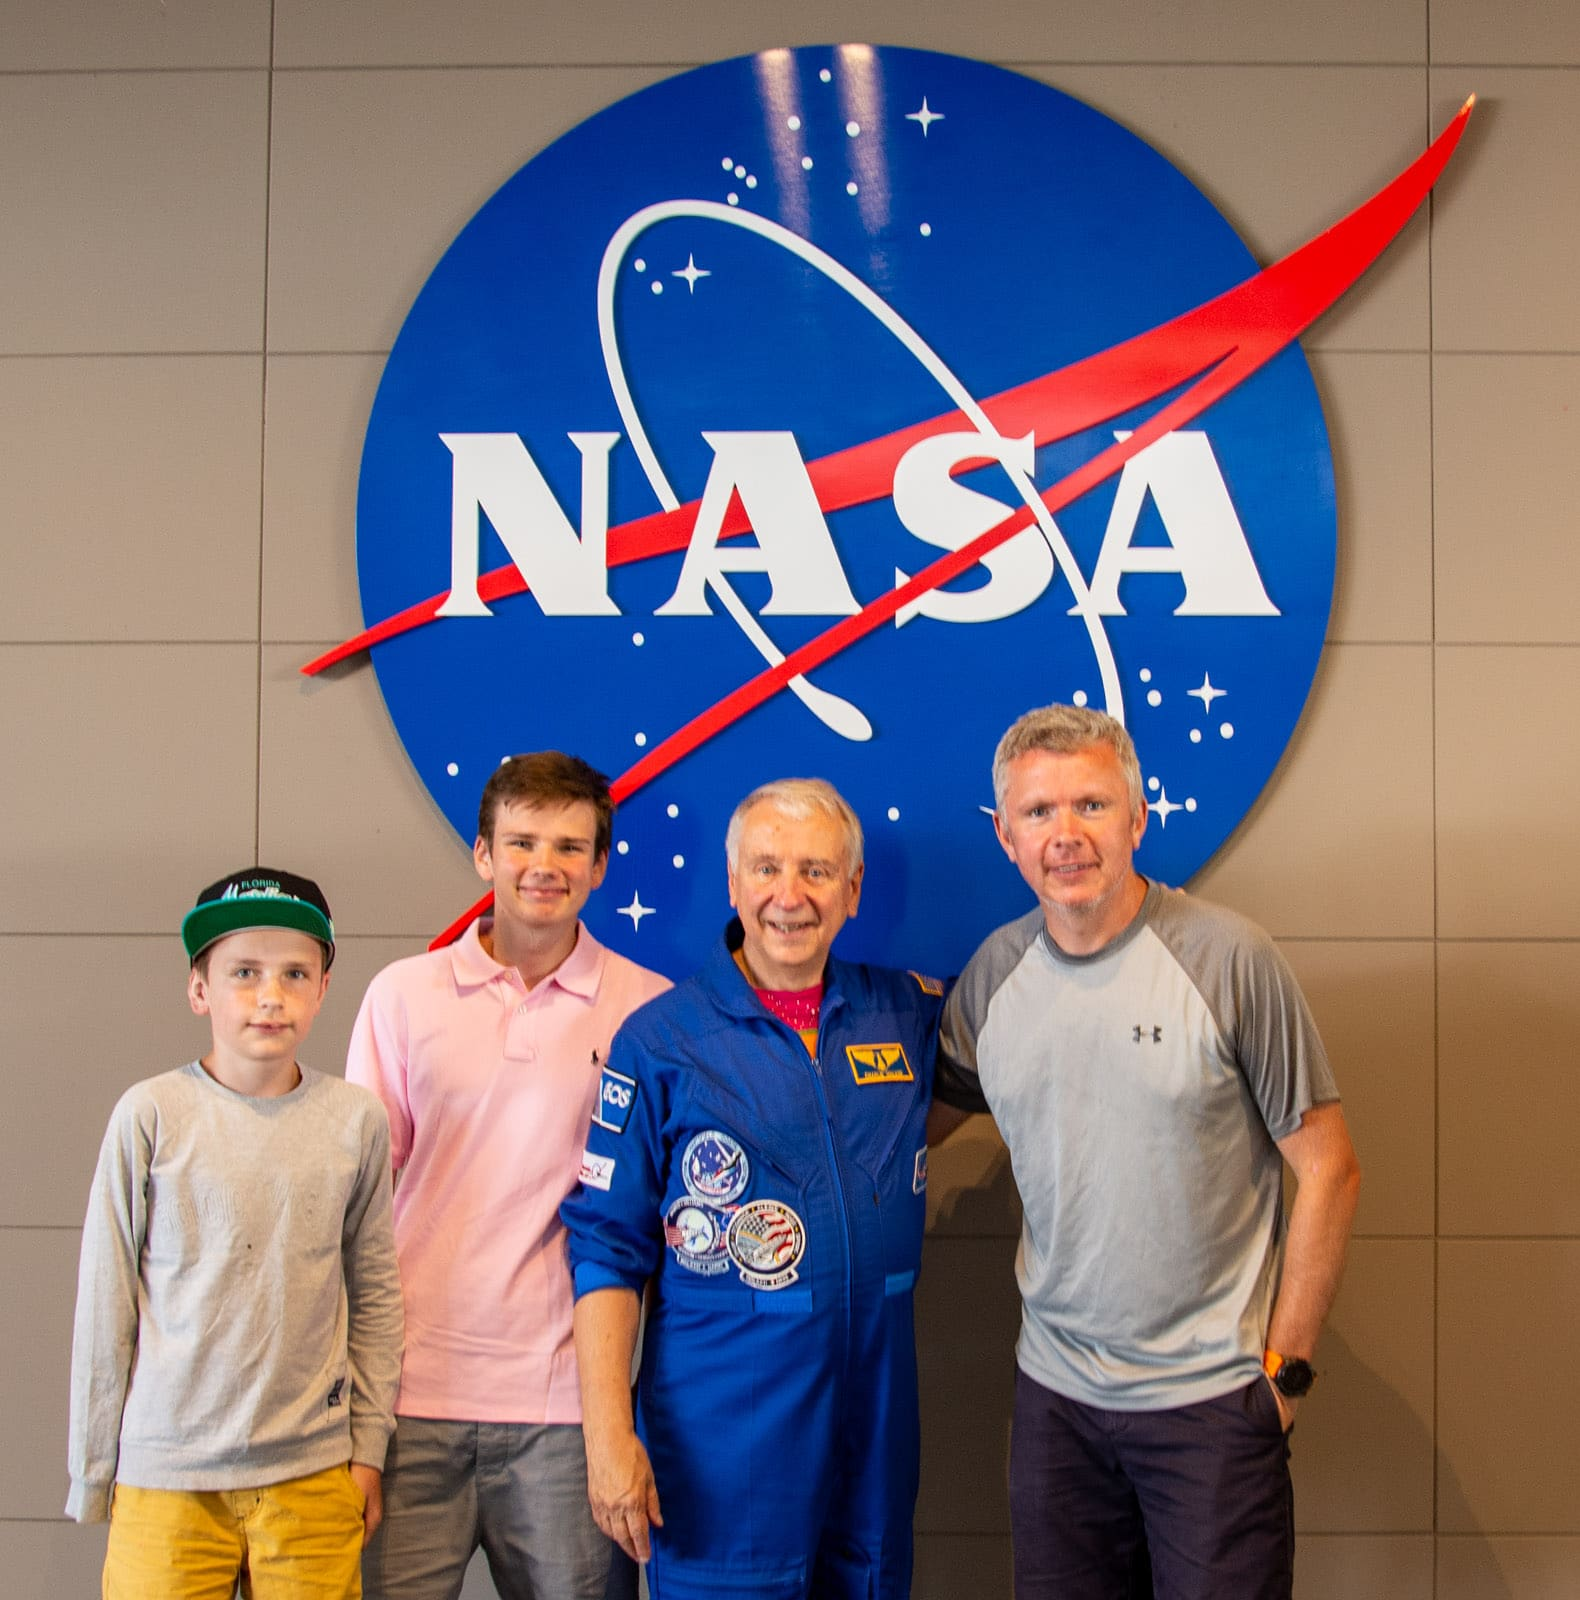 Dine with an astronaut